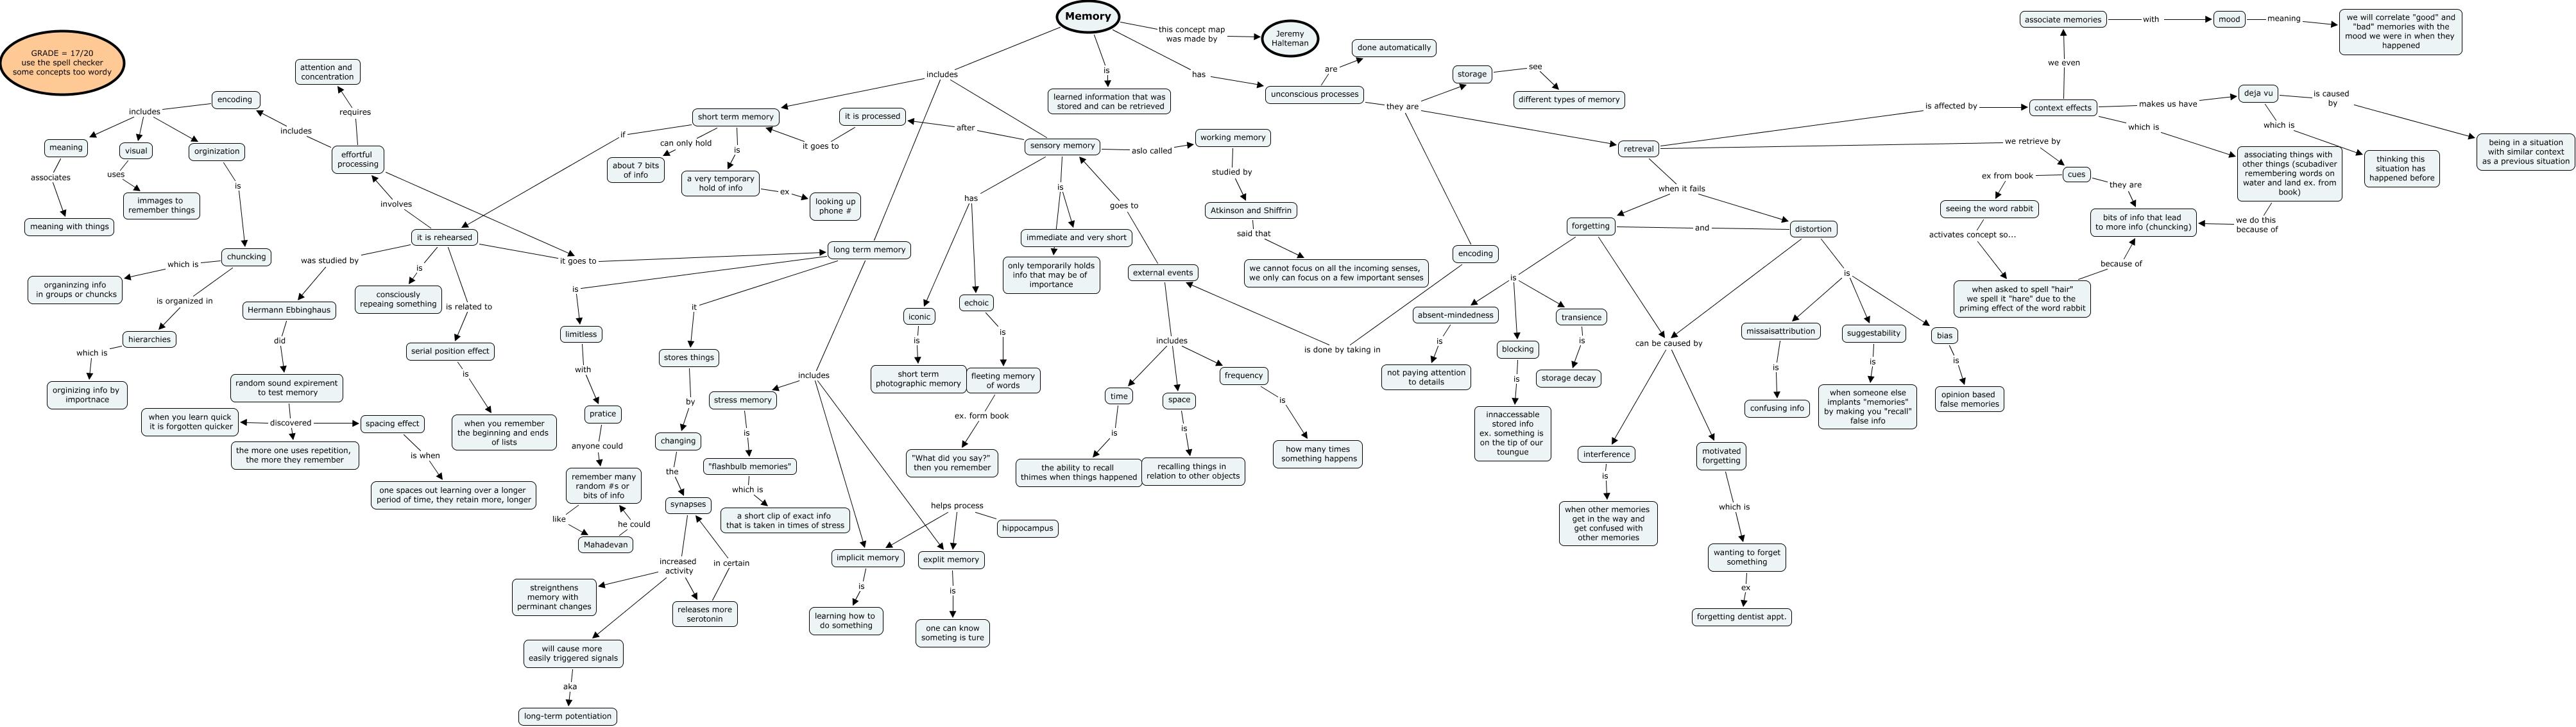 Memory Concept Map.Memory Ch 8 Concept Map Jeremy Halteman